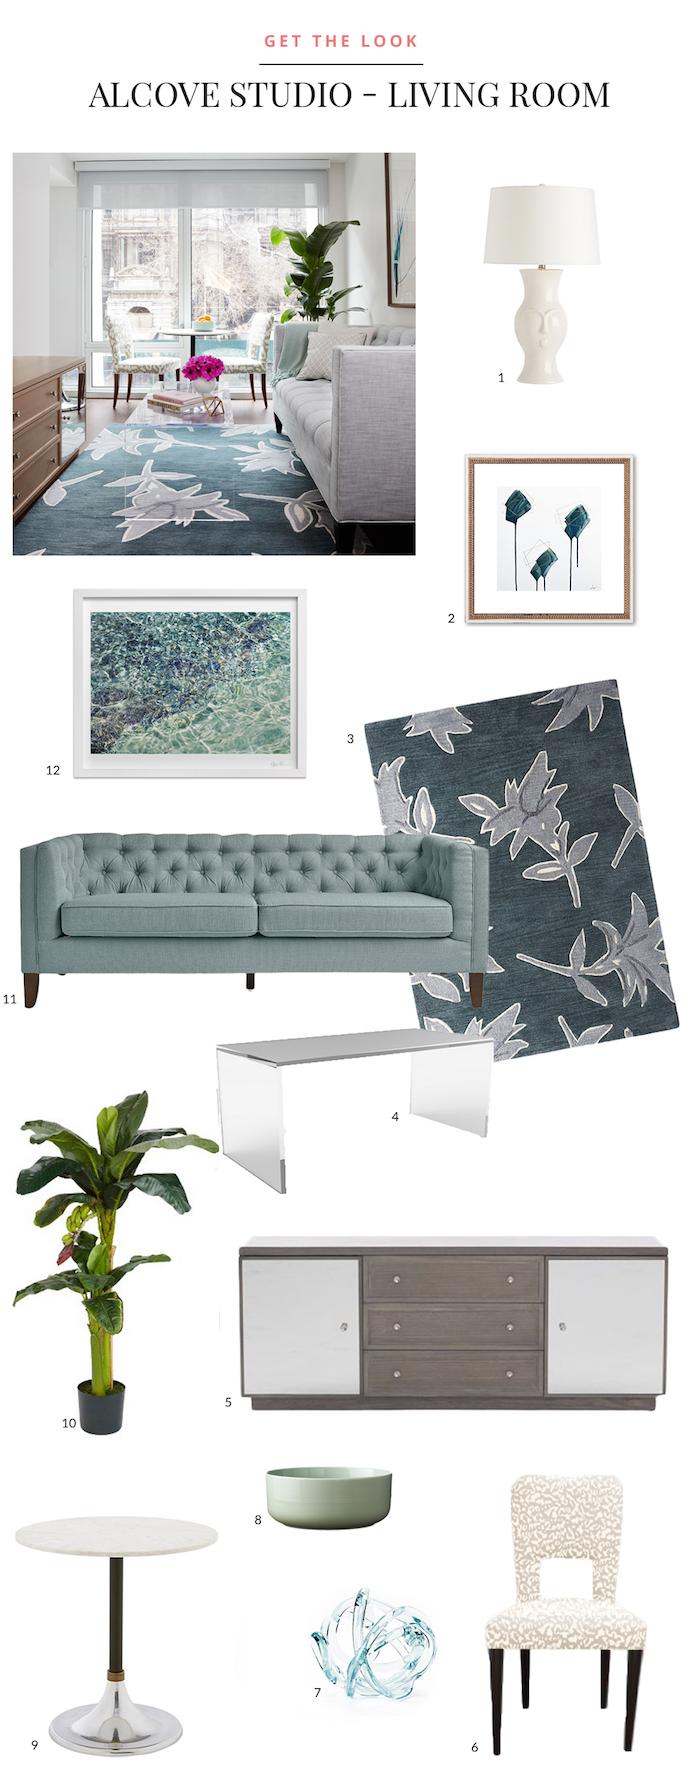 Alcove Studio - Living Room